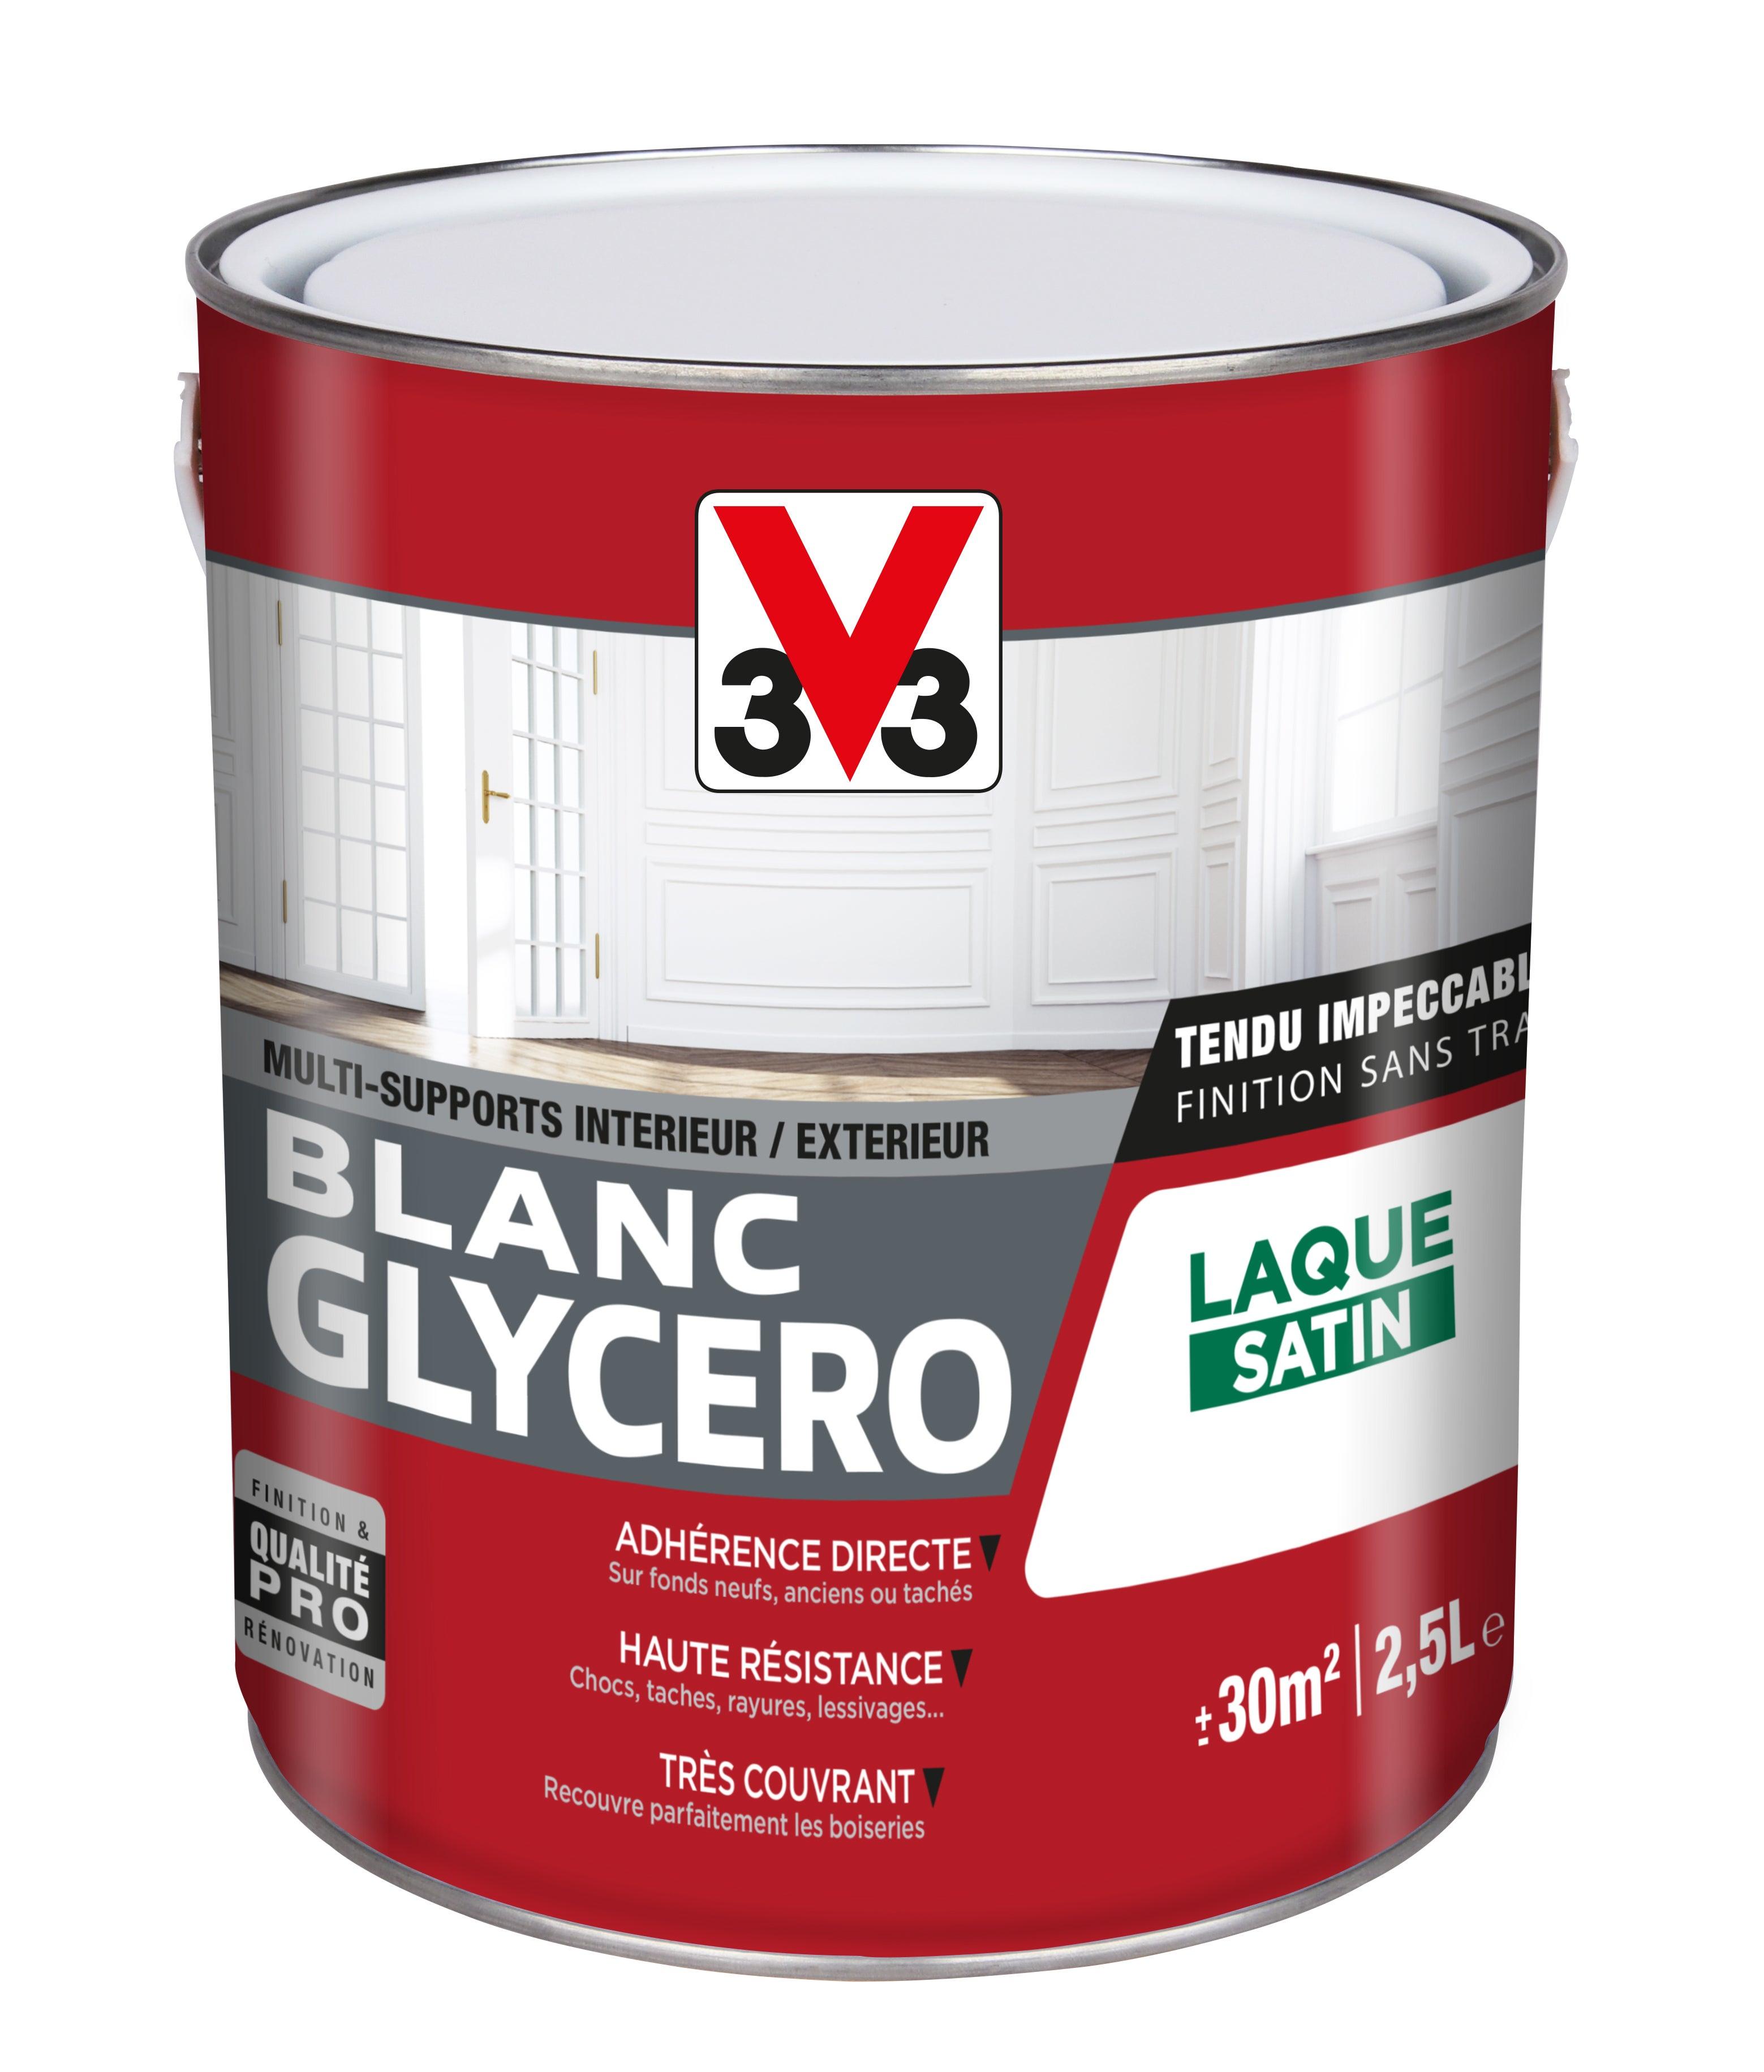 Peinture Multisupport V33 Glycero Blanc Satine 2 5 L Leroy Merlin